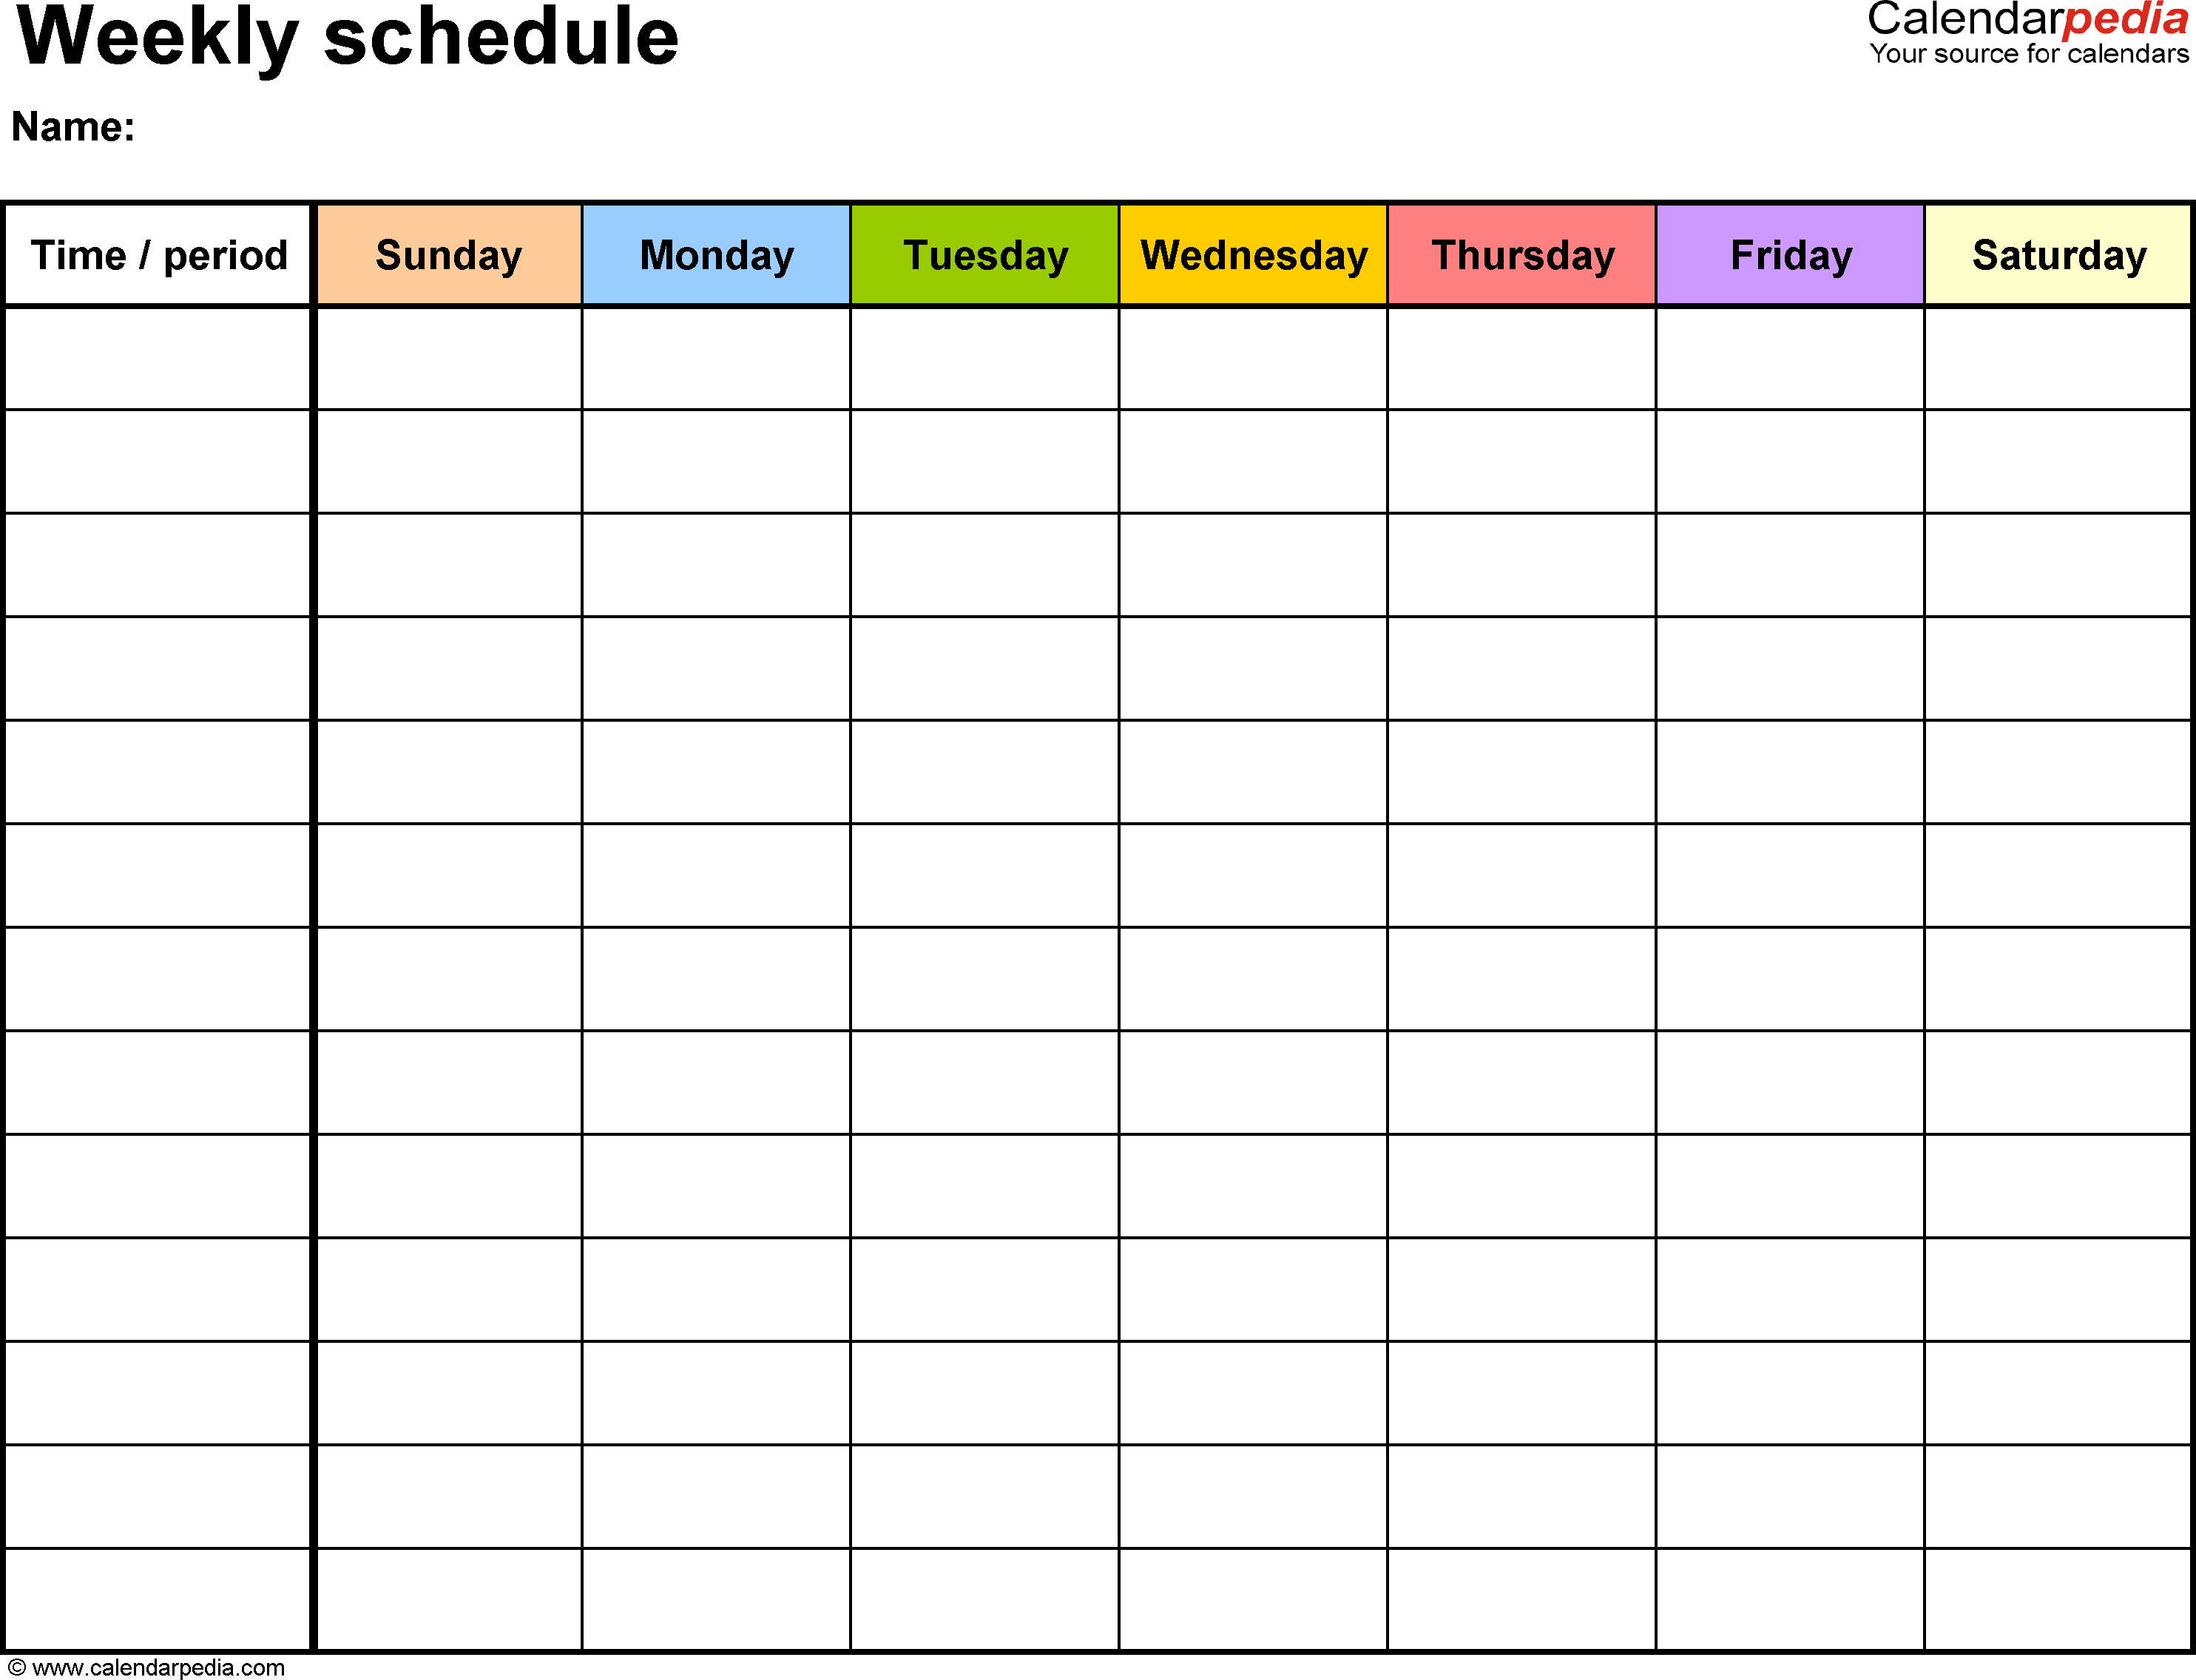 Sunday Through Saturday Schedule Template | Calendar For within Sunday Through Saturday Calendar